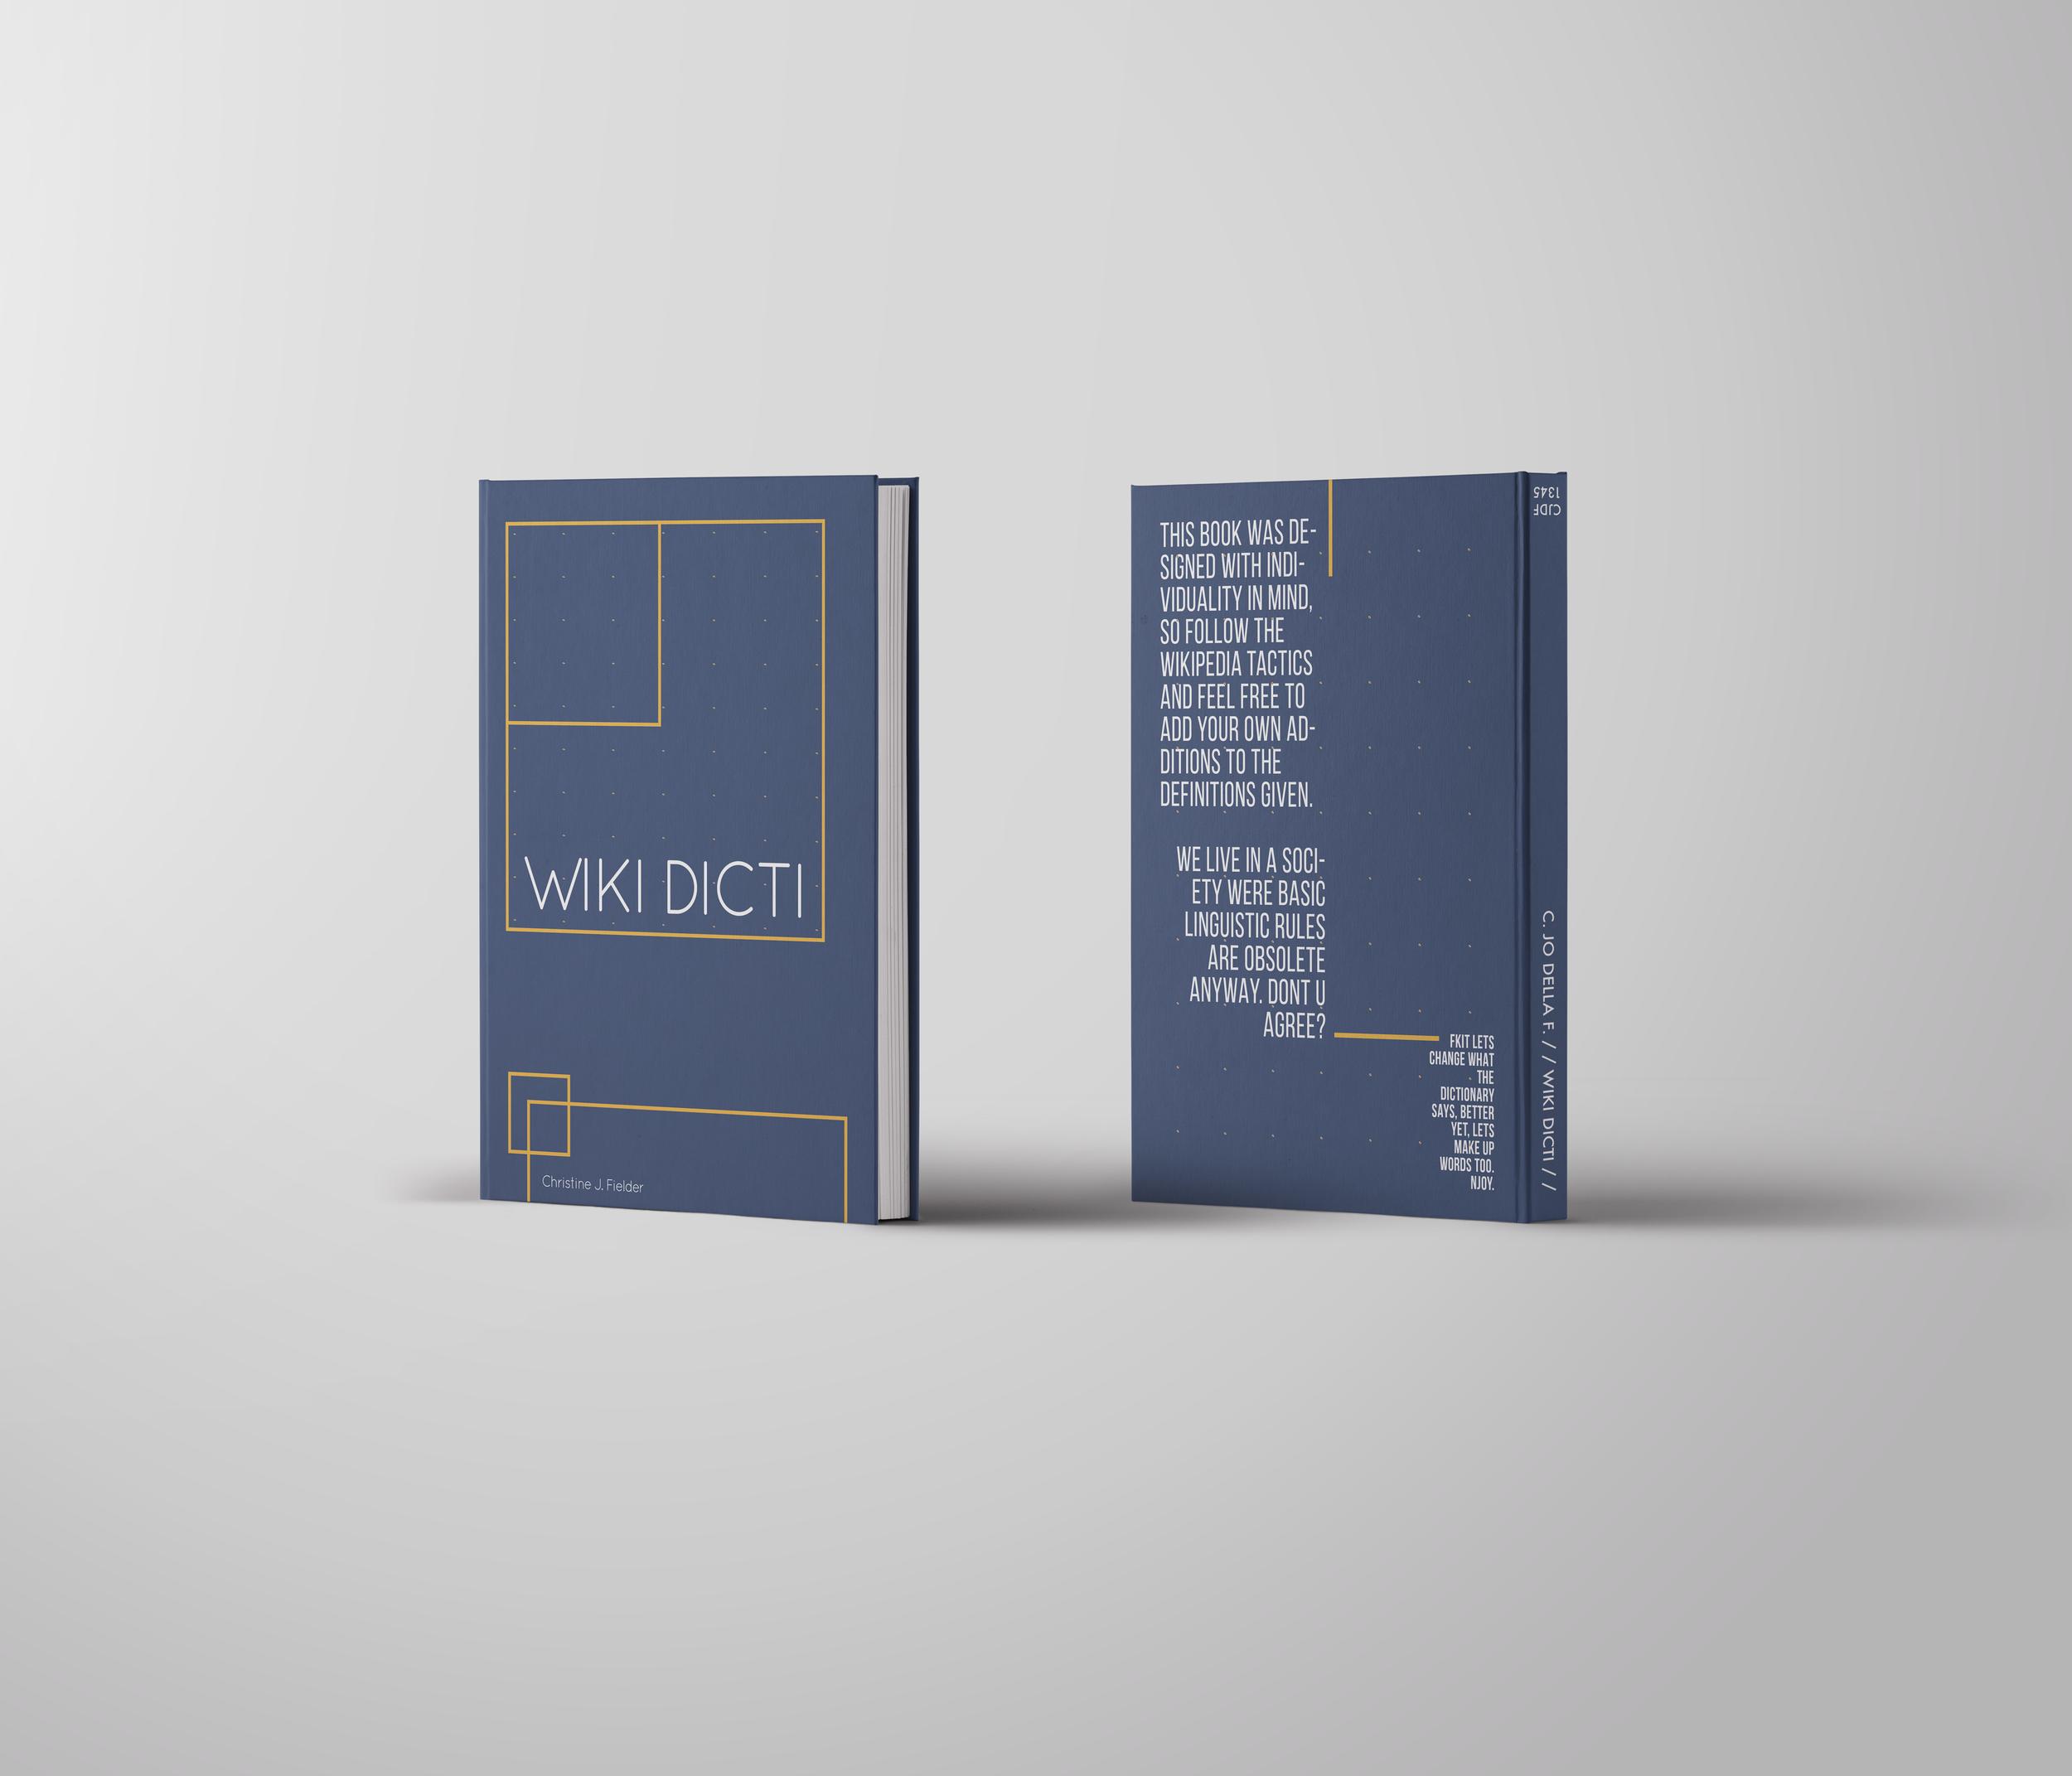 CHRISTINE FIELDER / WIKI DICTI